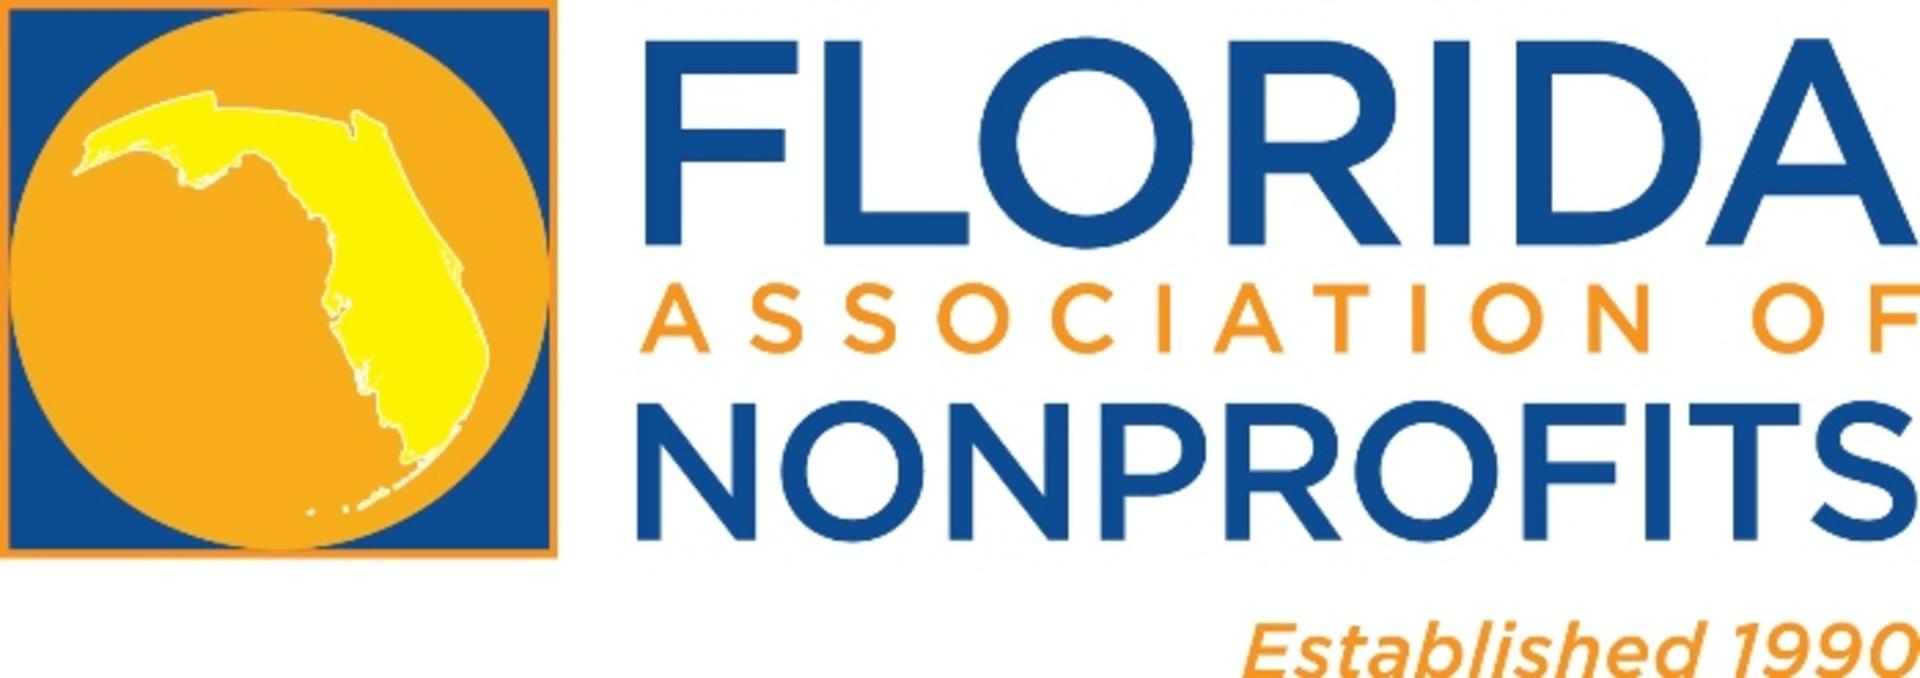 Florida Nonprofits\' Nonprofit Networking Event and Meet & Greet